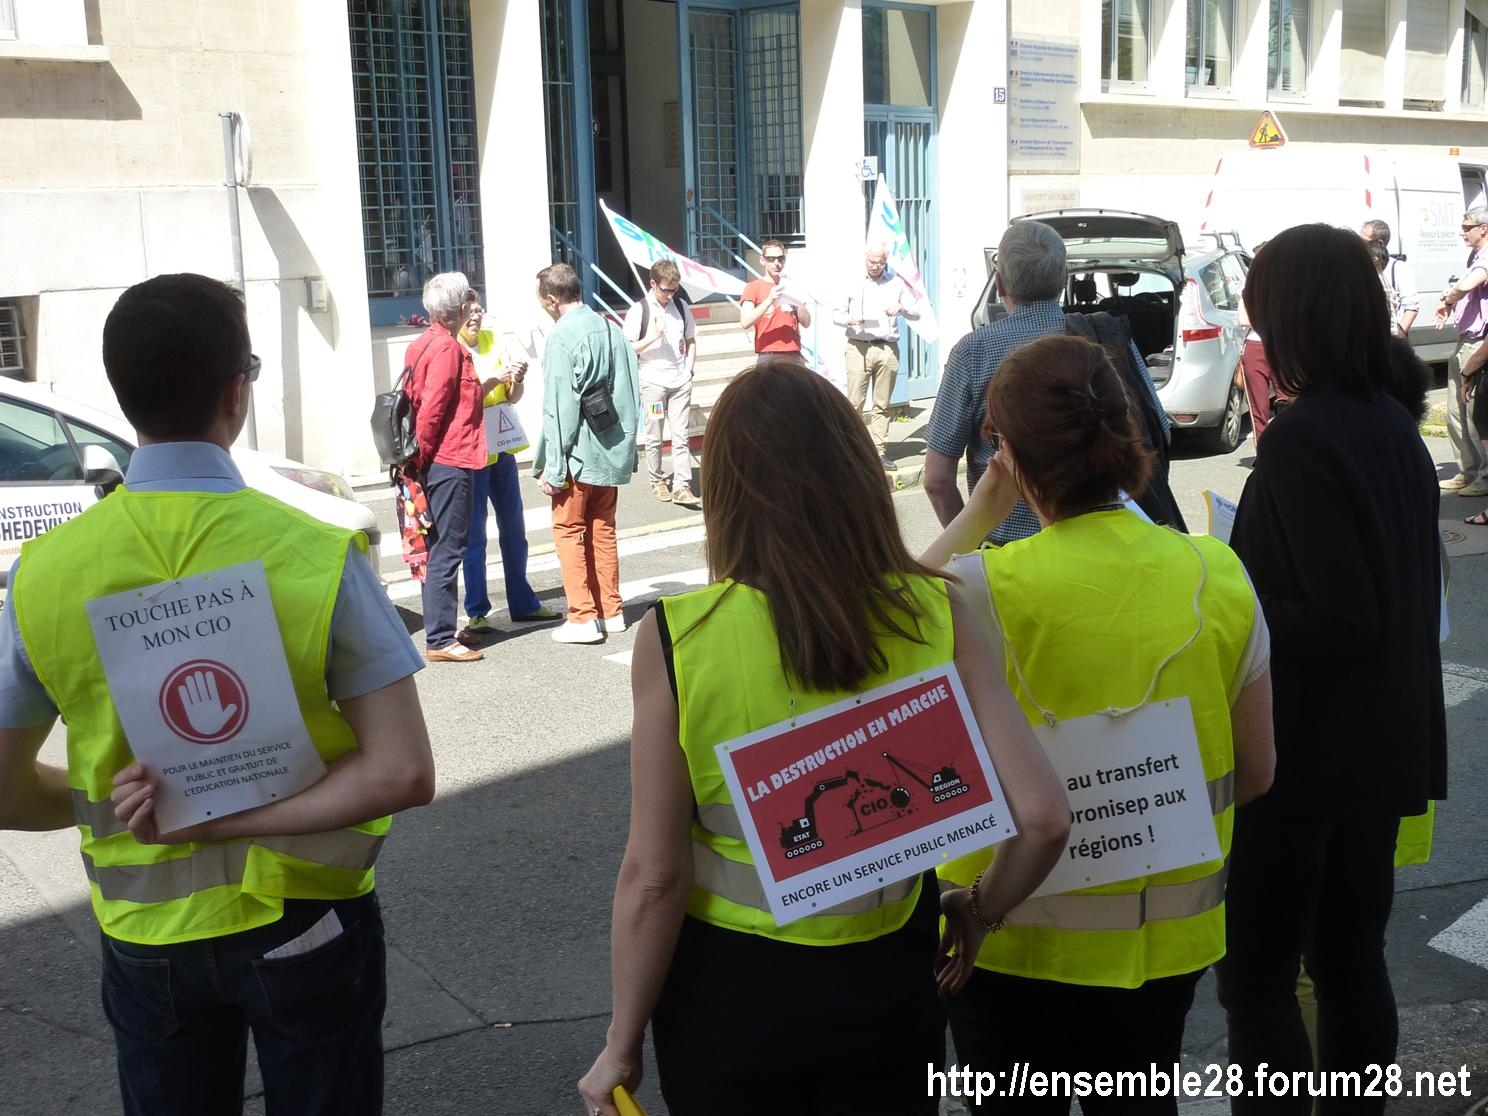 19-04-2018 Chartres Manifestation Interprofessionnelle CGT Solidaires SNES-FSU n°02